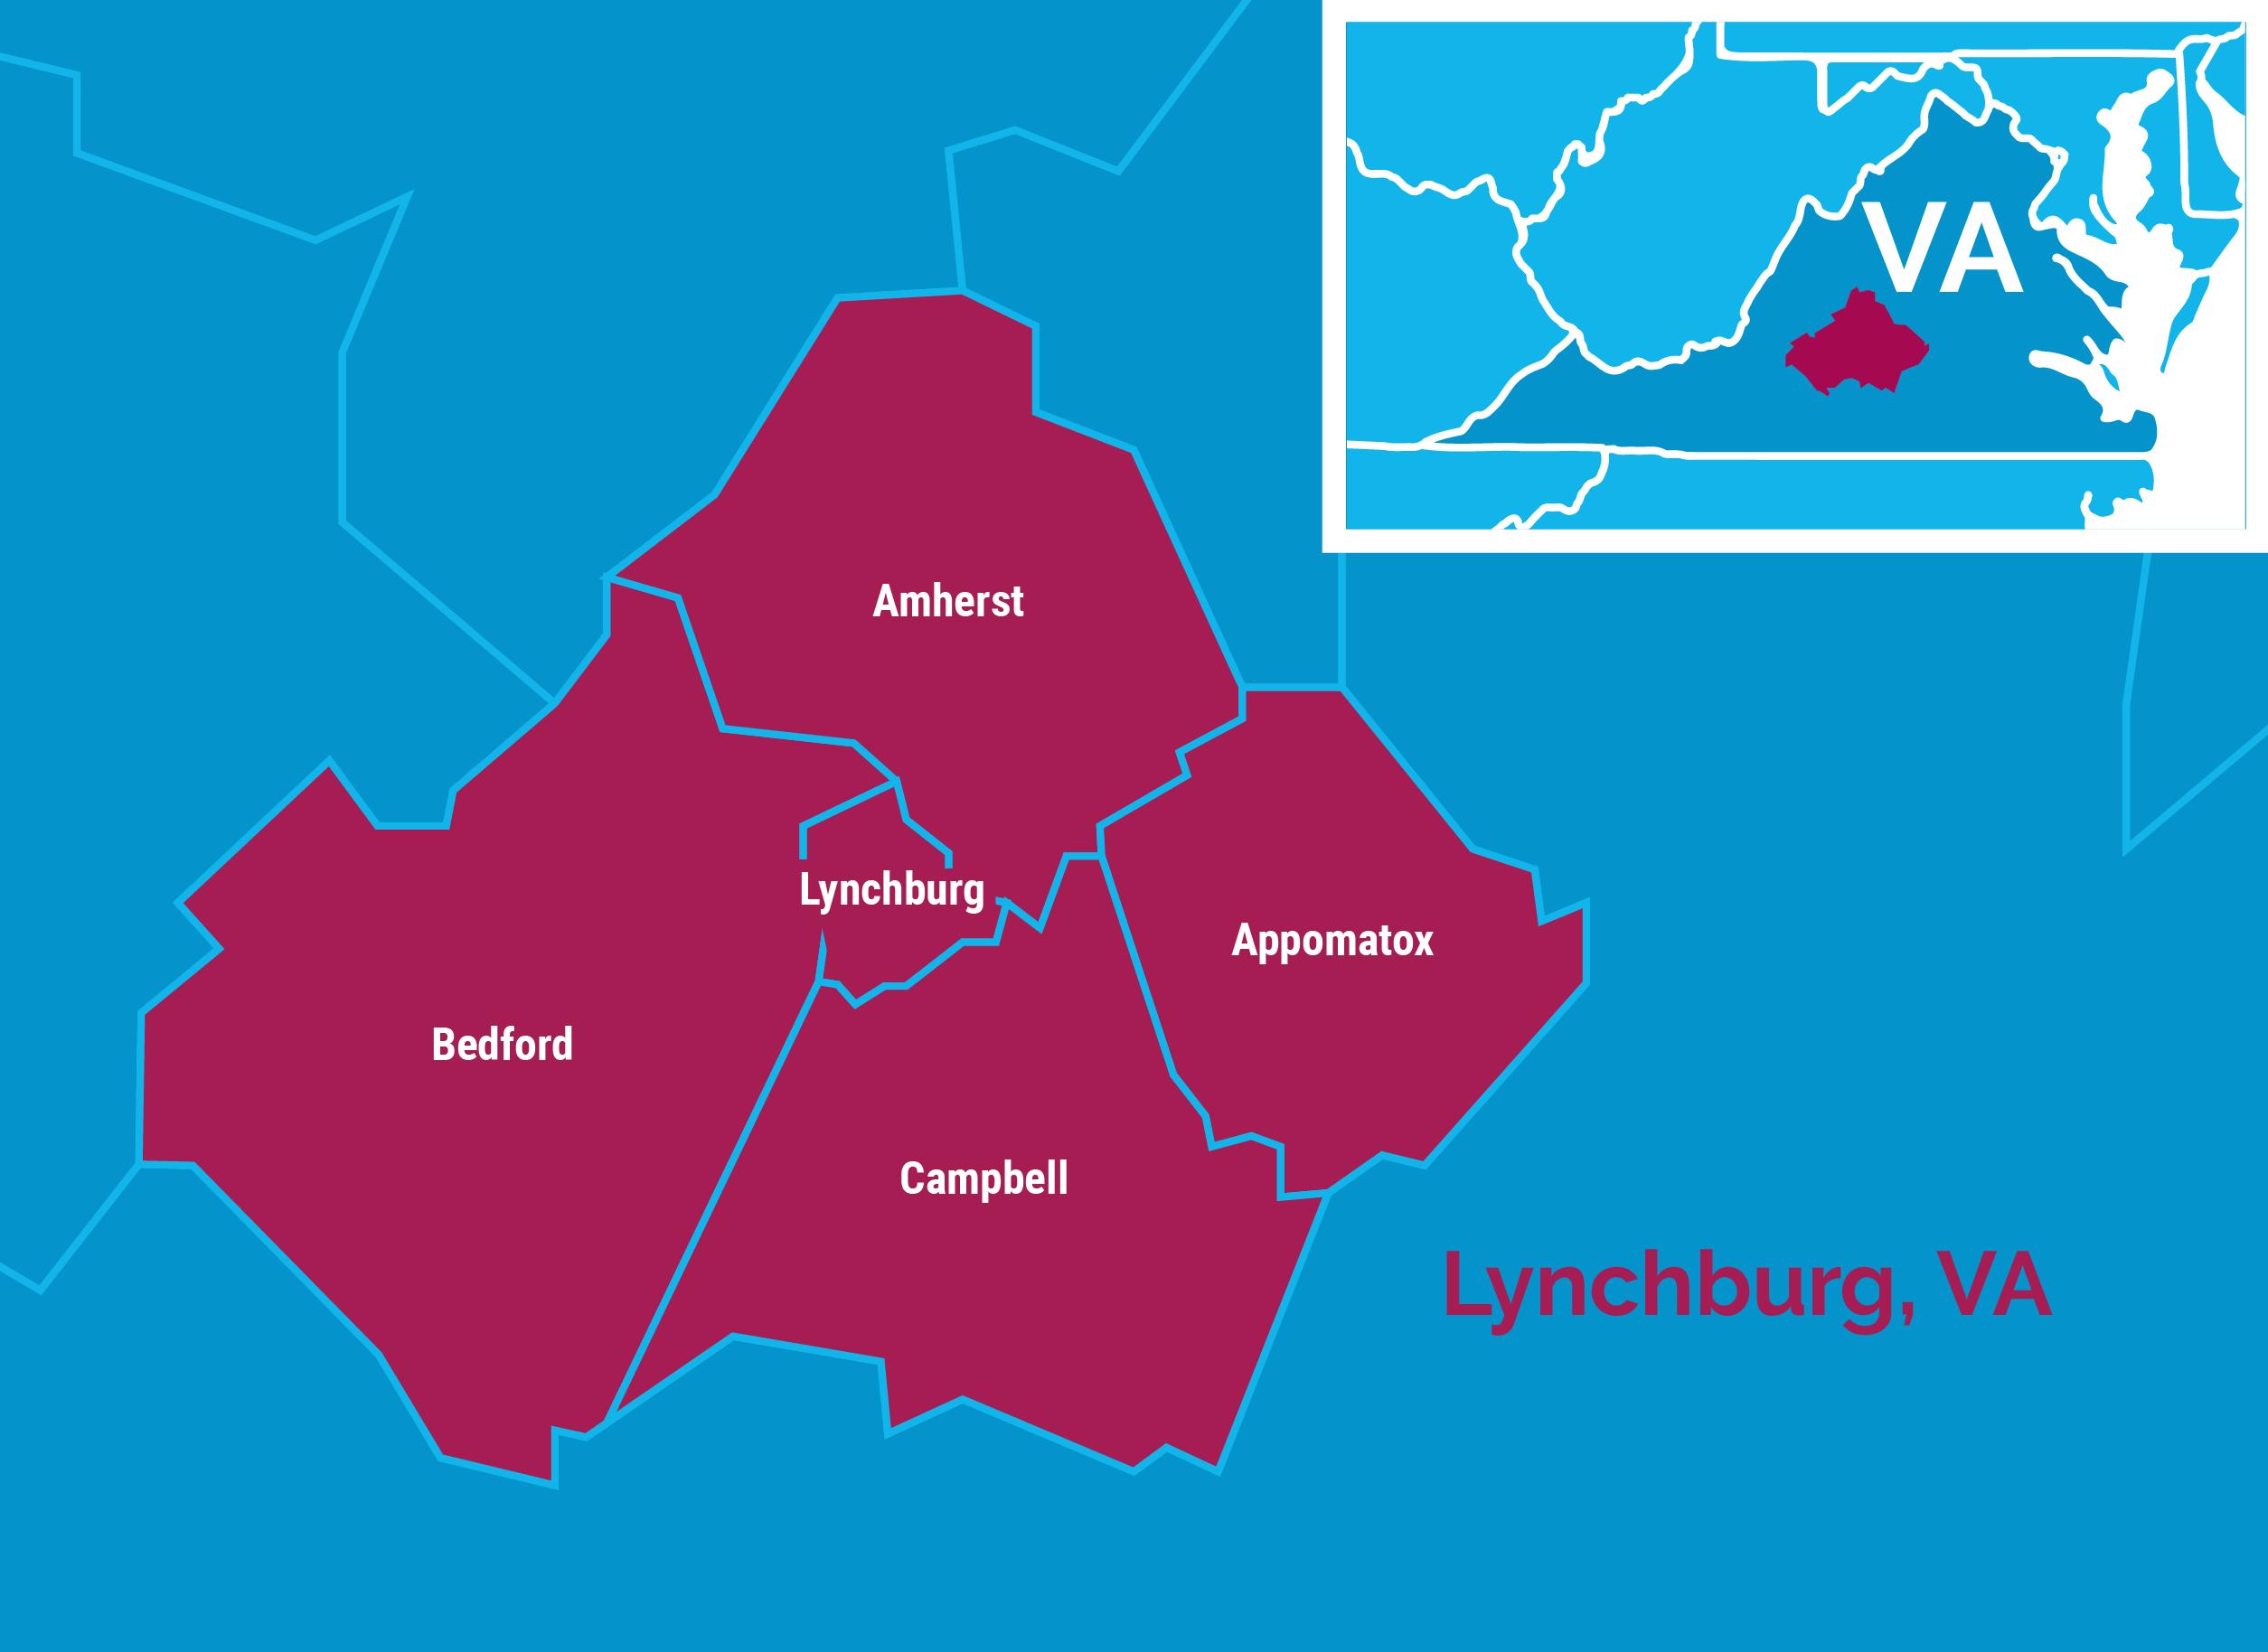 Map of Lynchburg, Virginia area